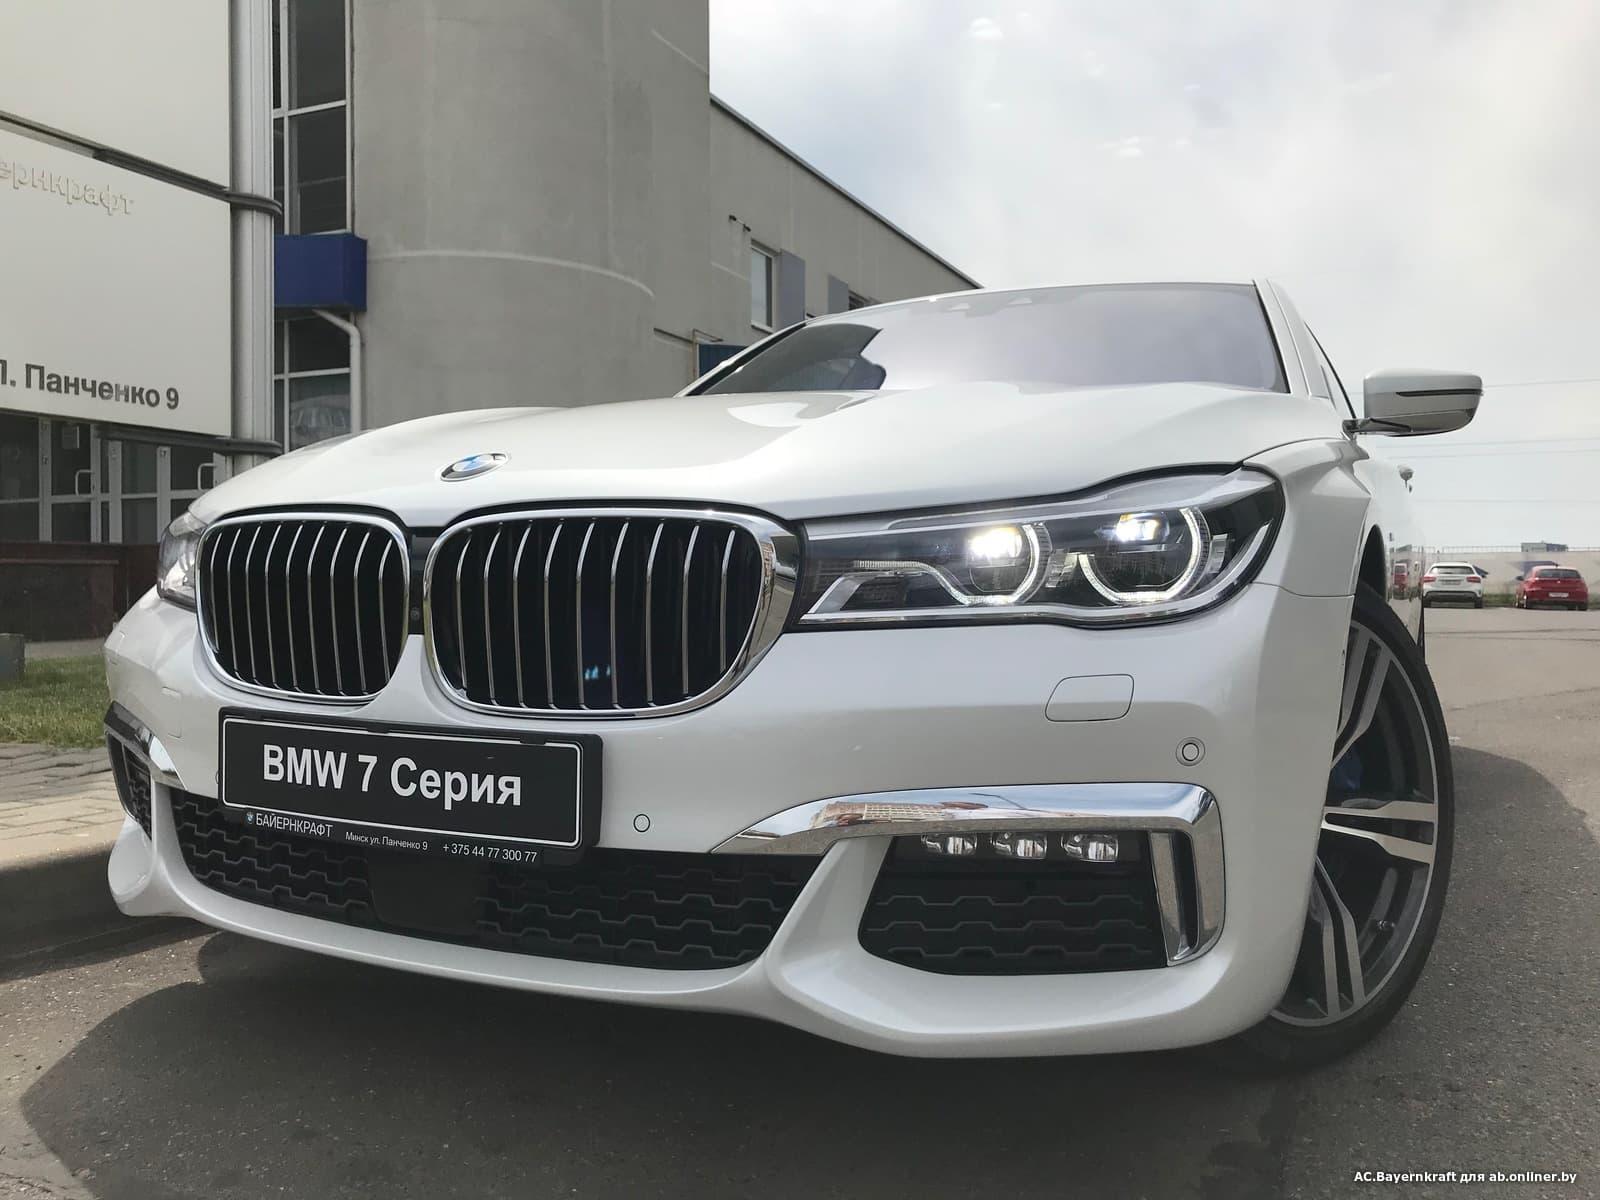 BMW 740 Ld xDrive